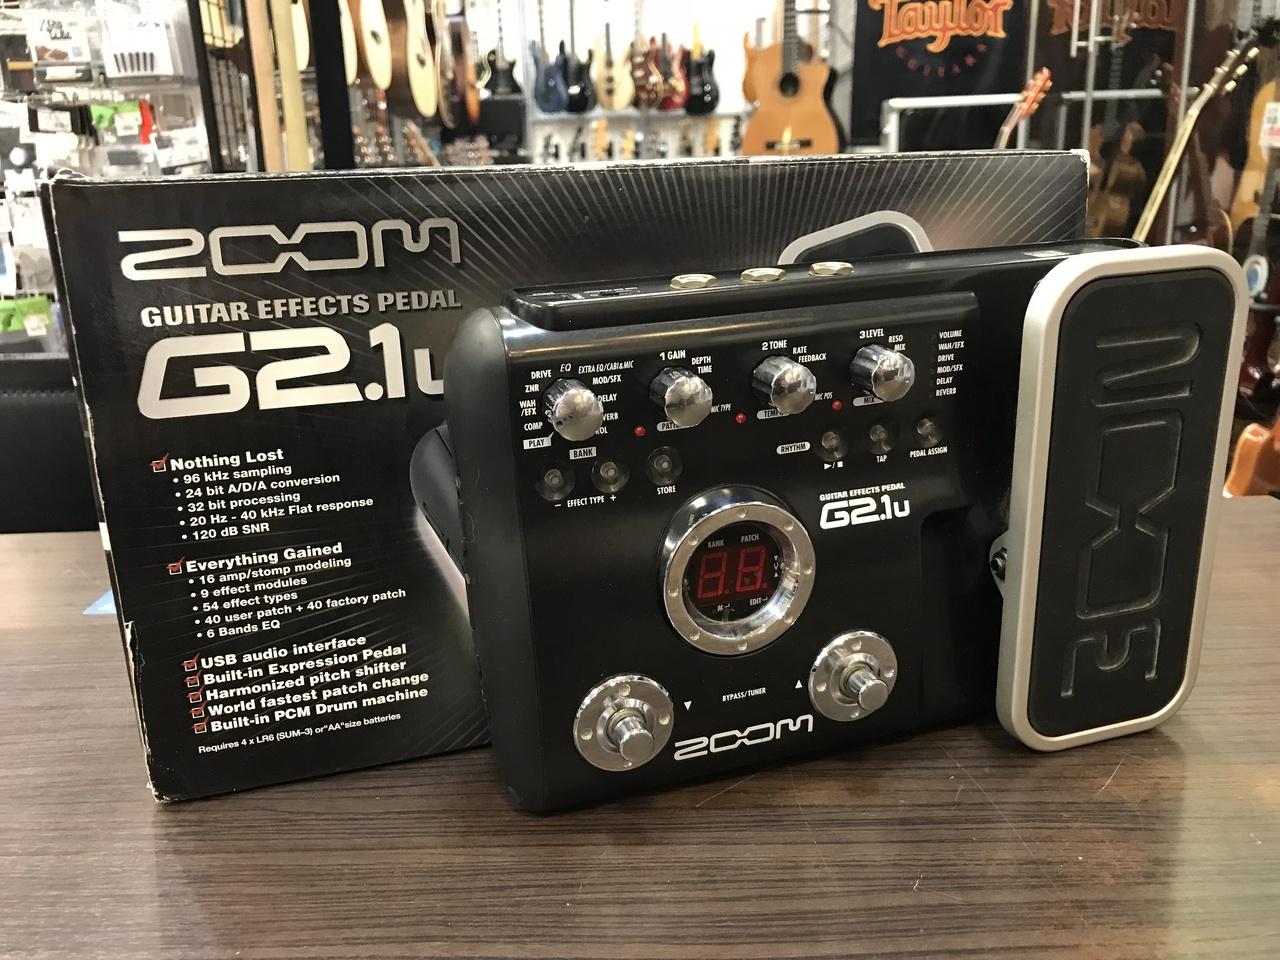 ZOOM G2.1u吉他效果器踏板[使用文章] [原包裝盒,說明書·CD-ROM·與AC適配器]